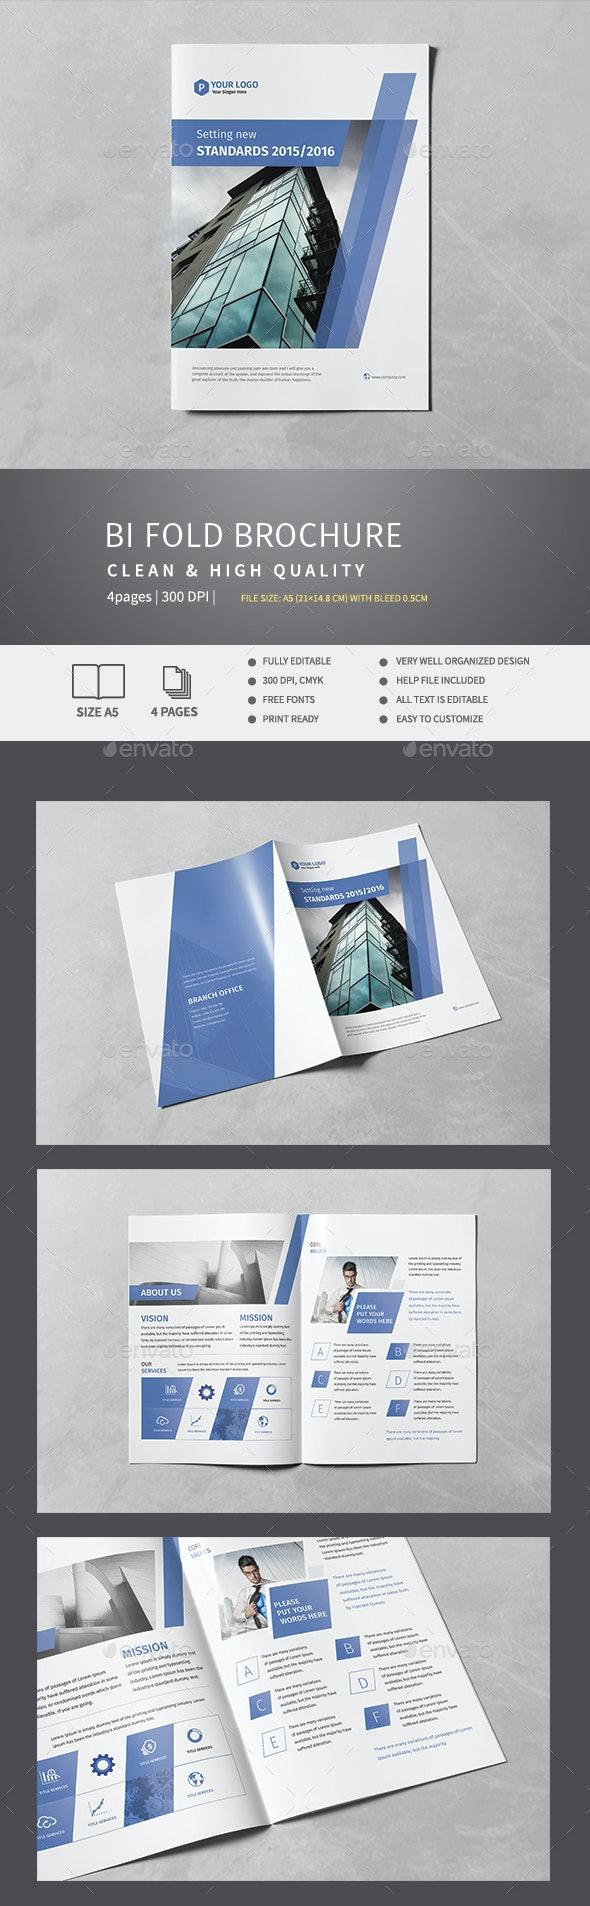 Corporate Bi-Fold Brochure v.5 - Corporate Brochures